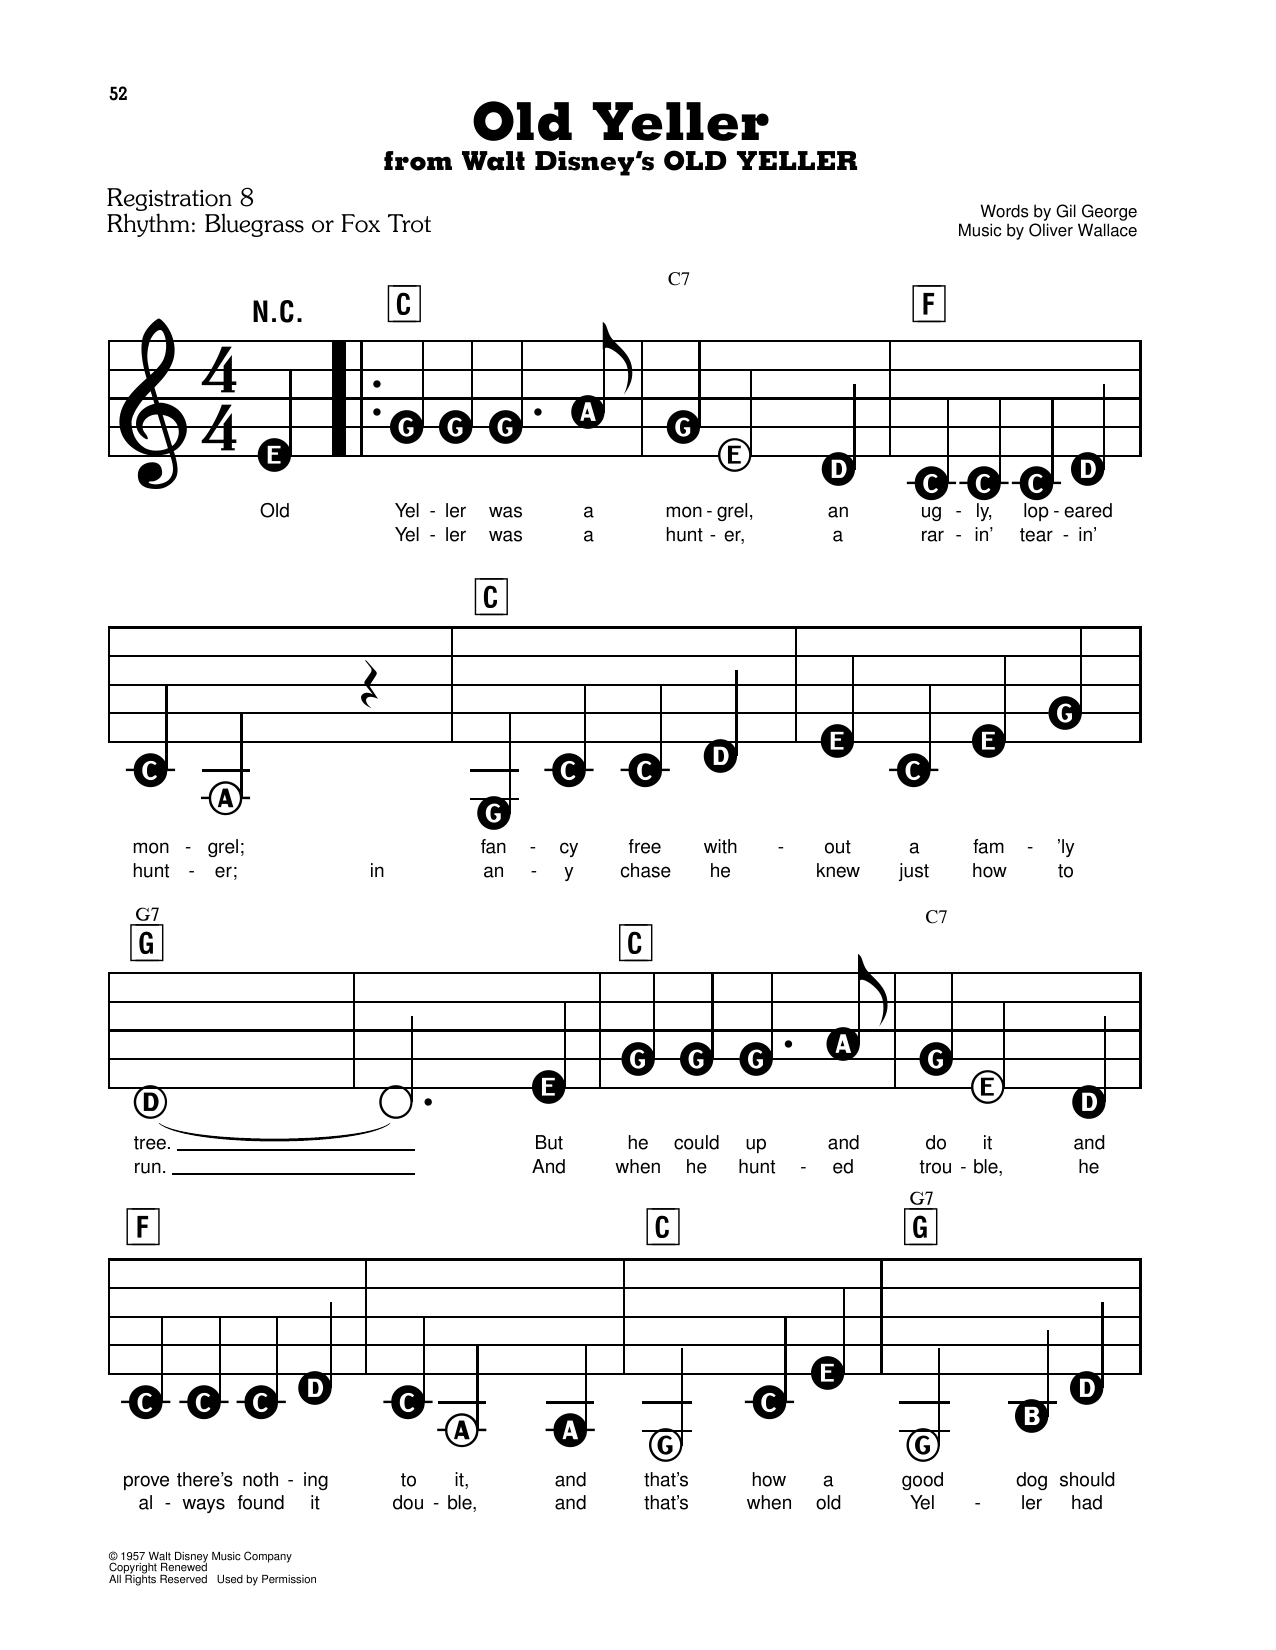 Old Yeller (from Walt Disney's Old Yeller) Sheet Music